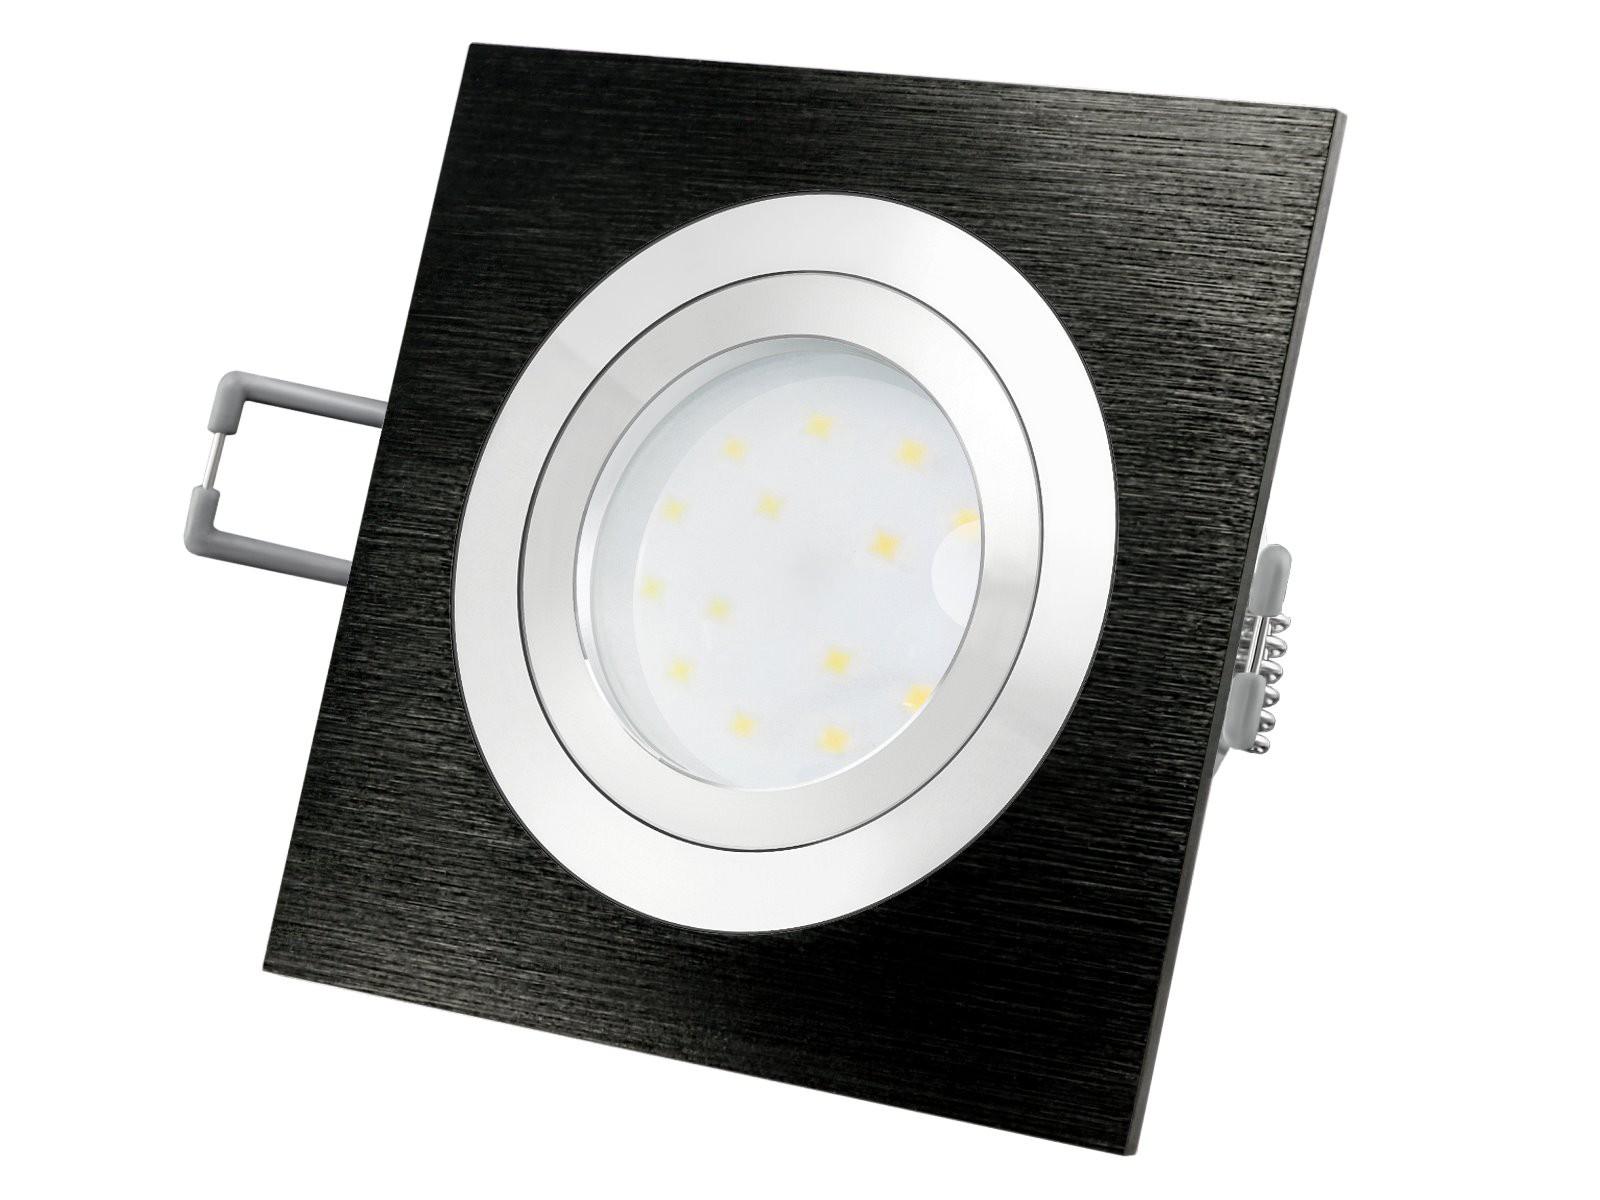 qf 2 led einbauleuchte alu schwarz schwenkbar flach inkl led modul 230v 5w warm wei 2700k. Black Bedroom Furniture Sets. Home Design Ideas